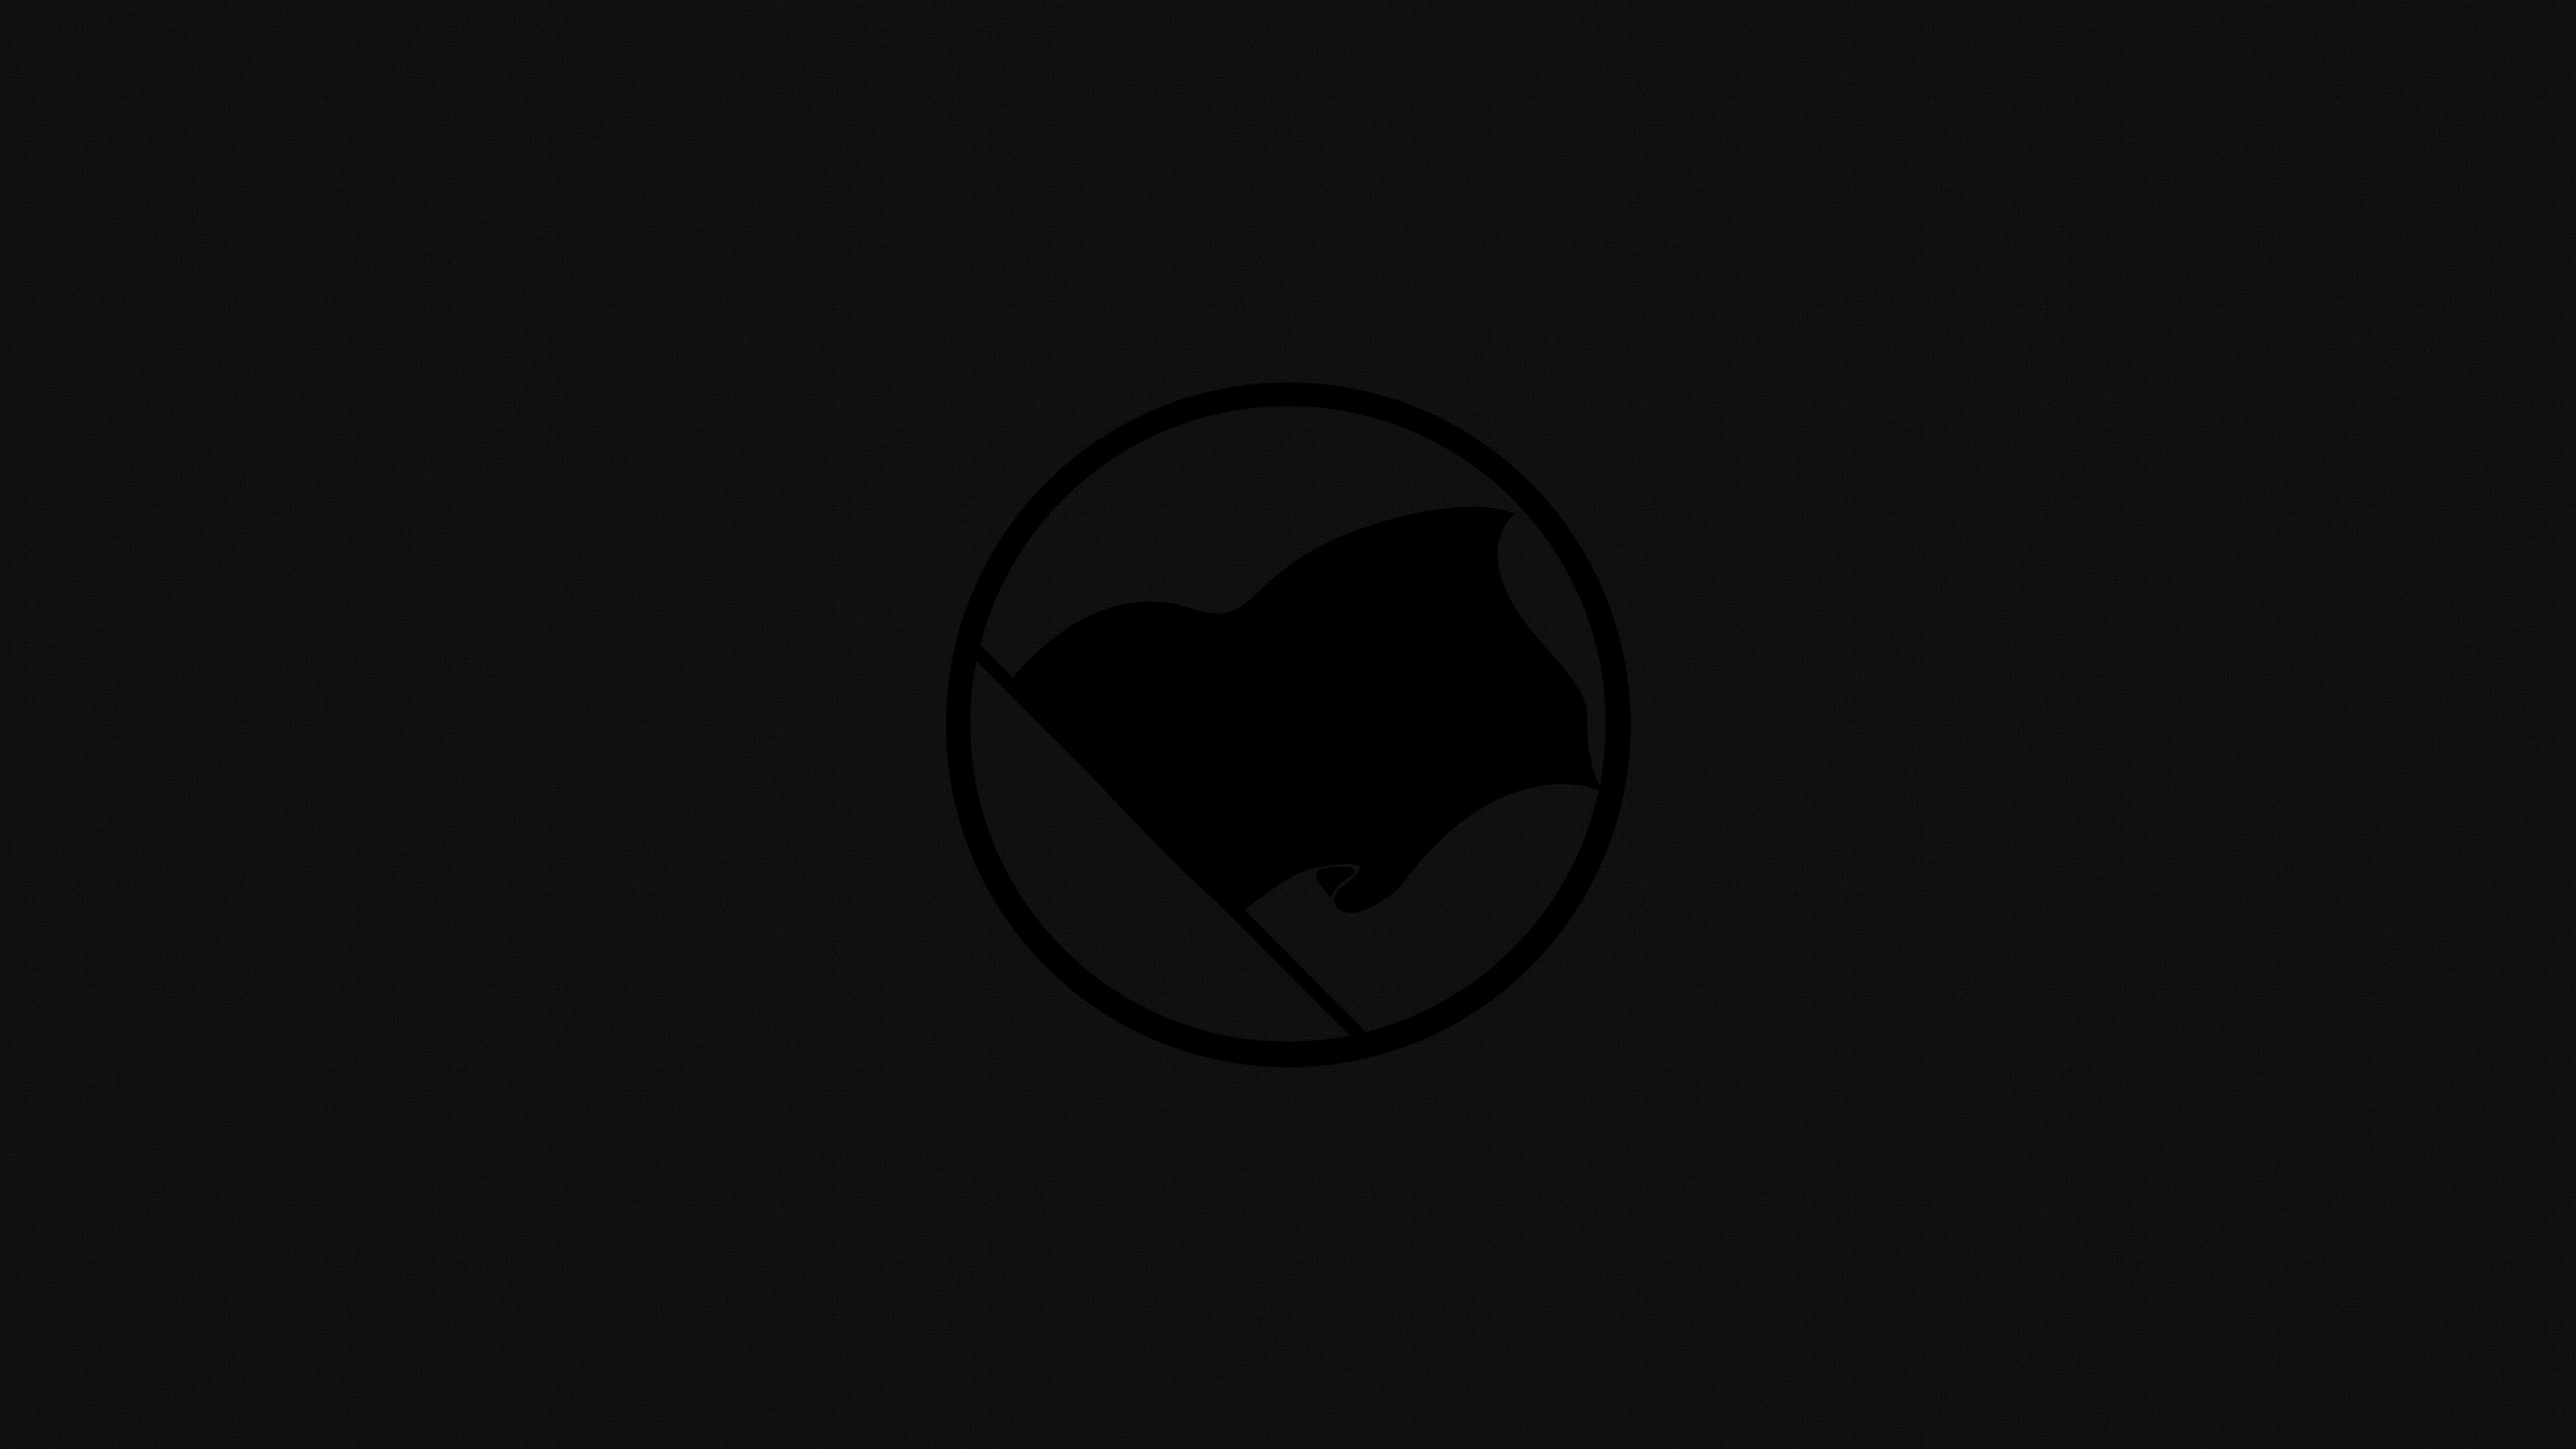 flag dark minimalism background 4k 1540754347 - Flag Dark Minimalism Background 4k - minimalism wallpapers, hd-wallpapers, flag wallpapers, digital art wallpapers, dark wallpapers, artwork wallpapers, artist wallpapers, 4k-wallpapers